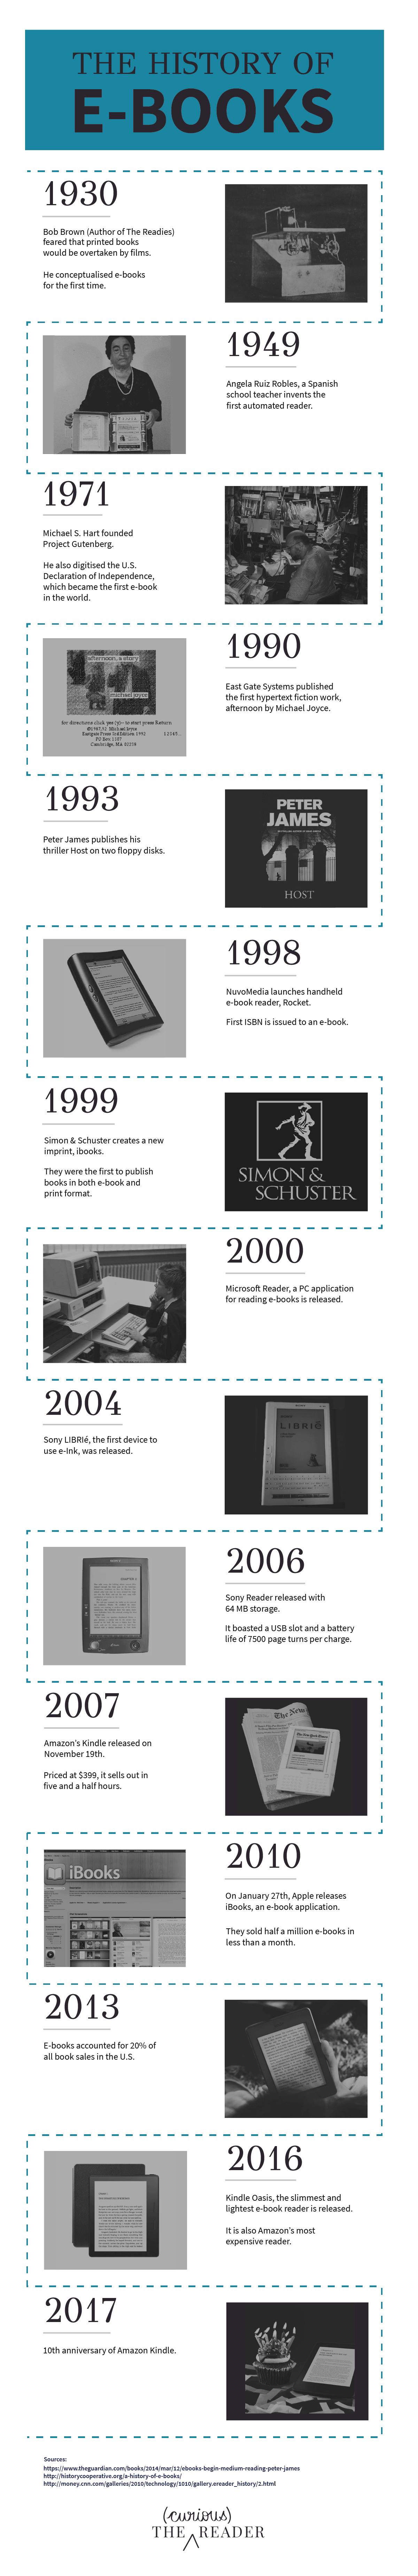 e-books infographic